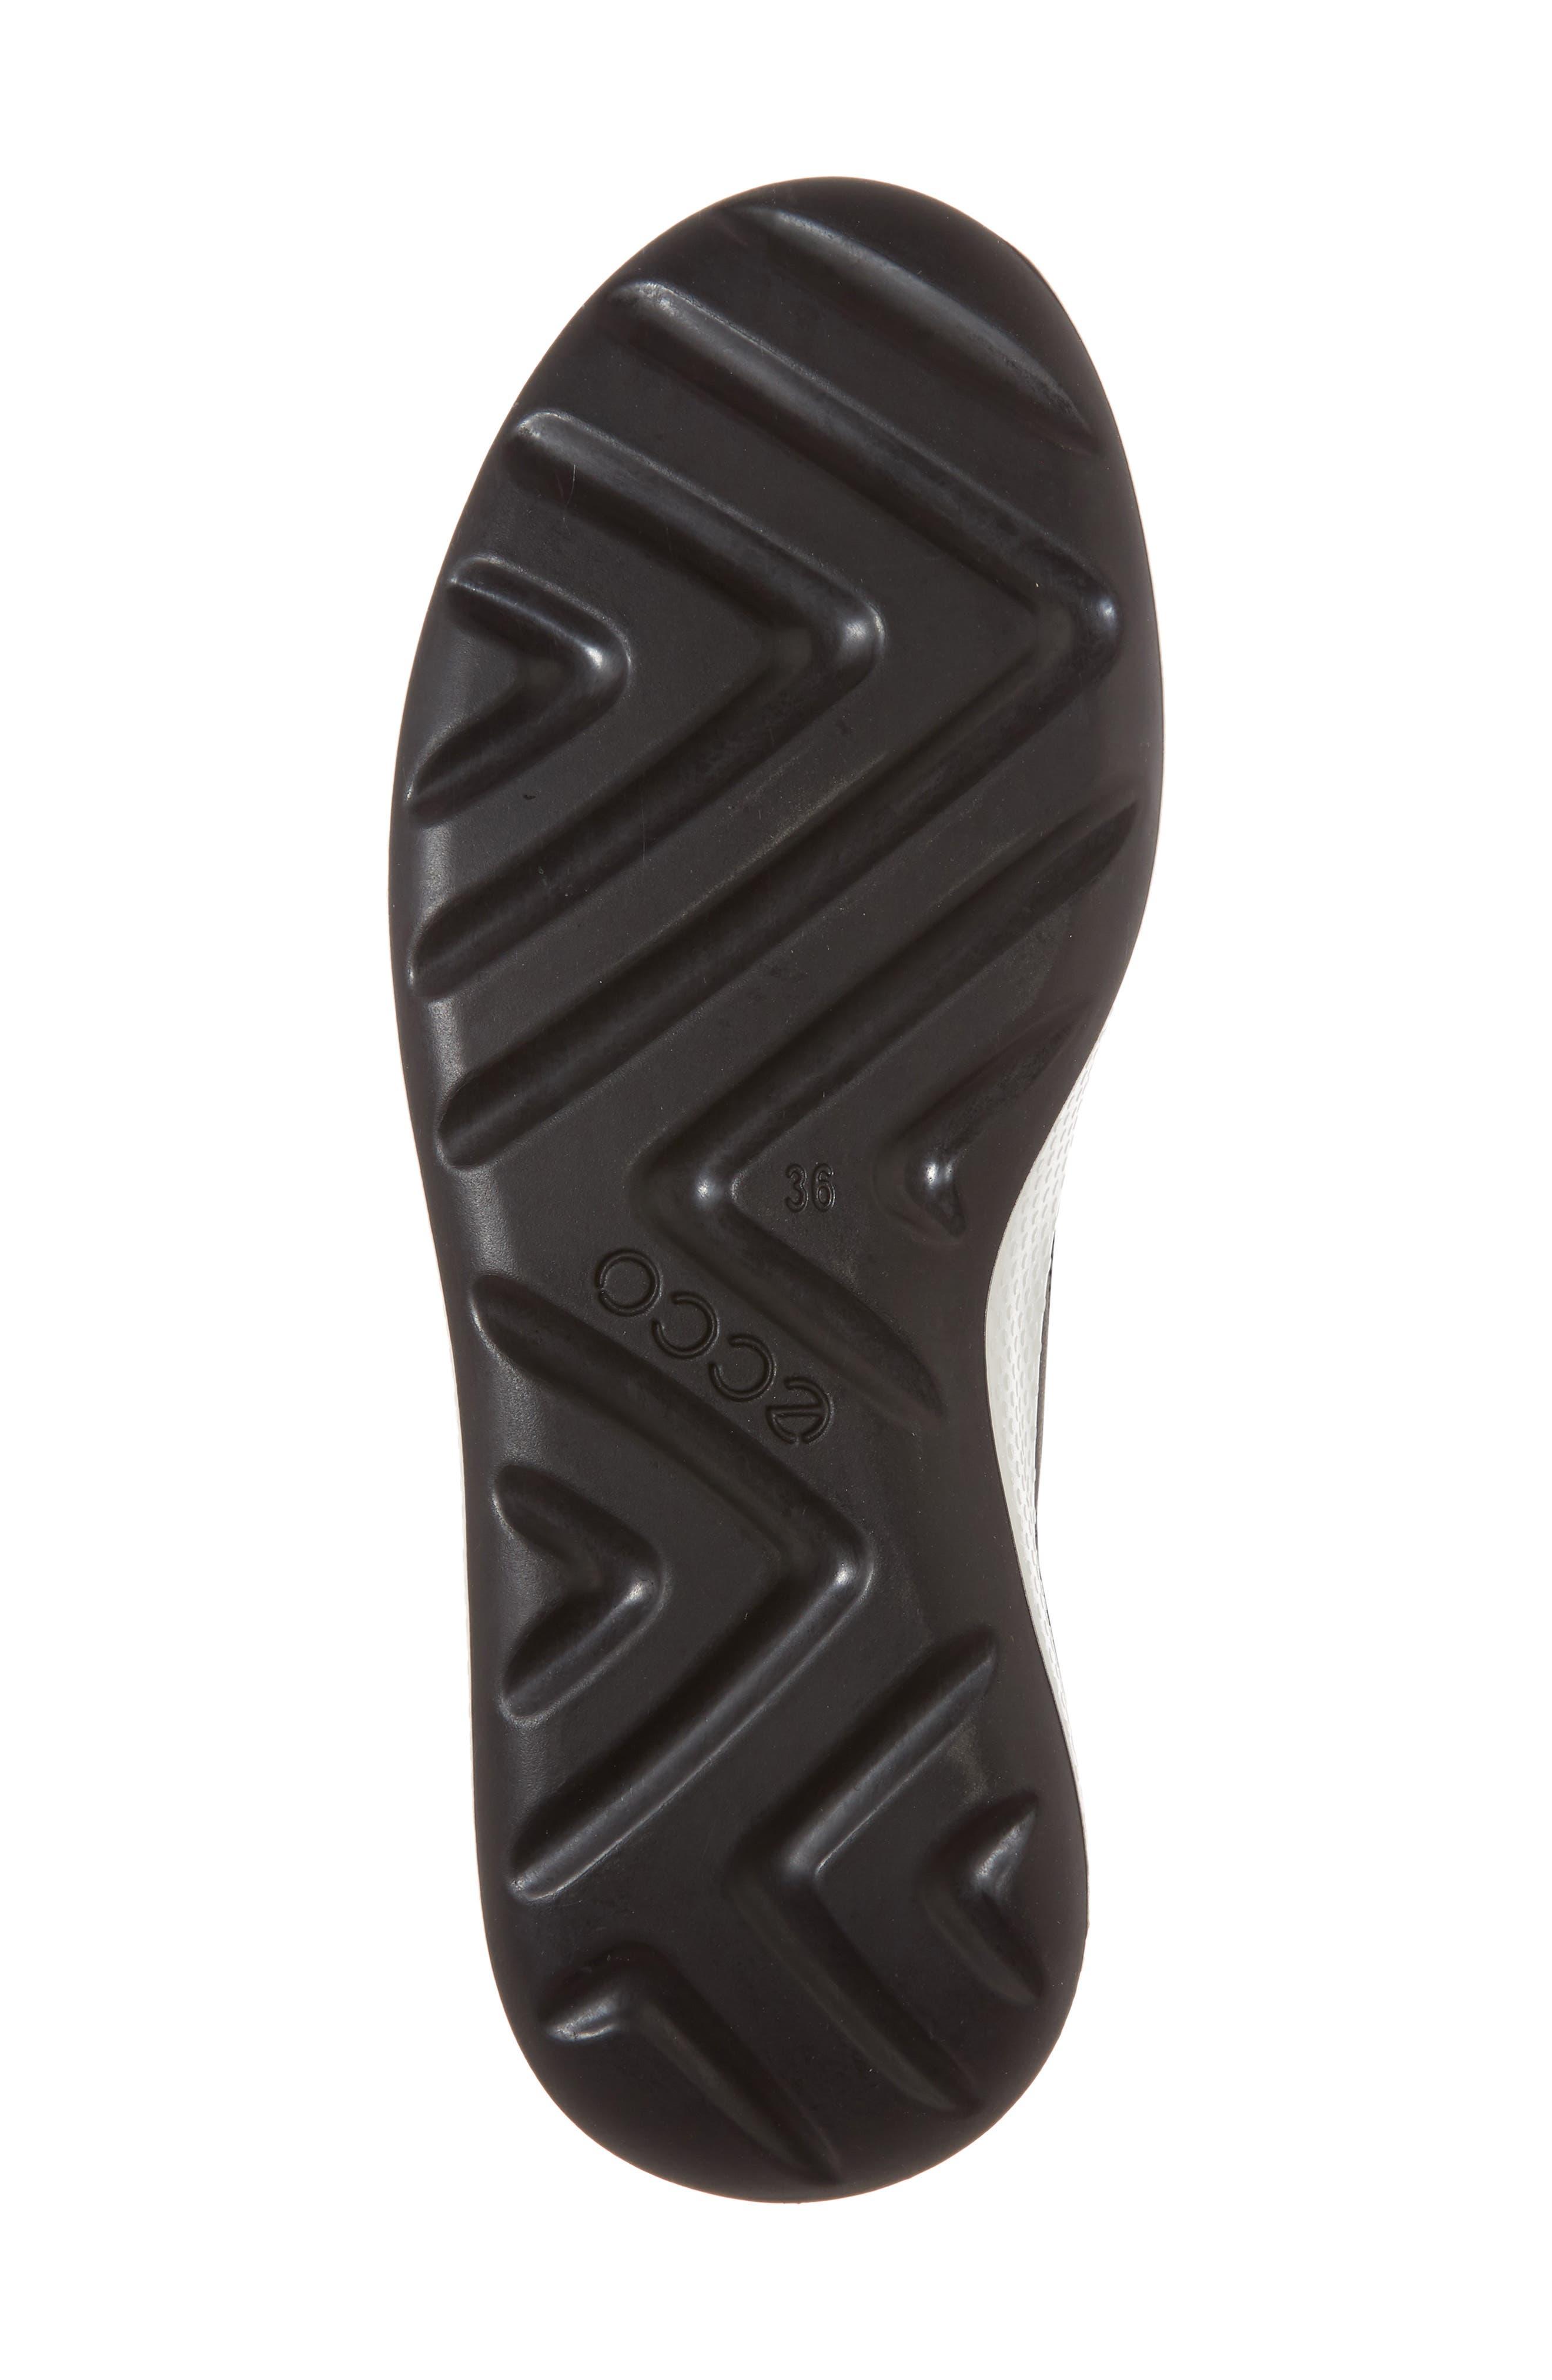 Ukiuk Genuine Shearling Boot,                             Alternate thumbnail 6, color,                             Black Leather